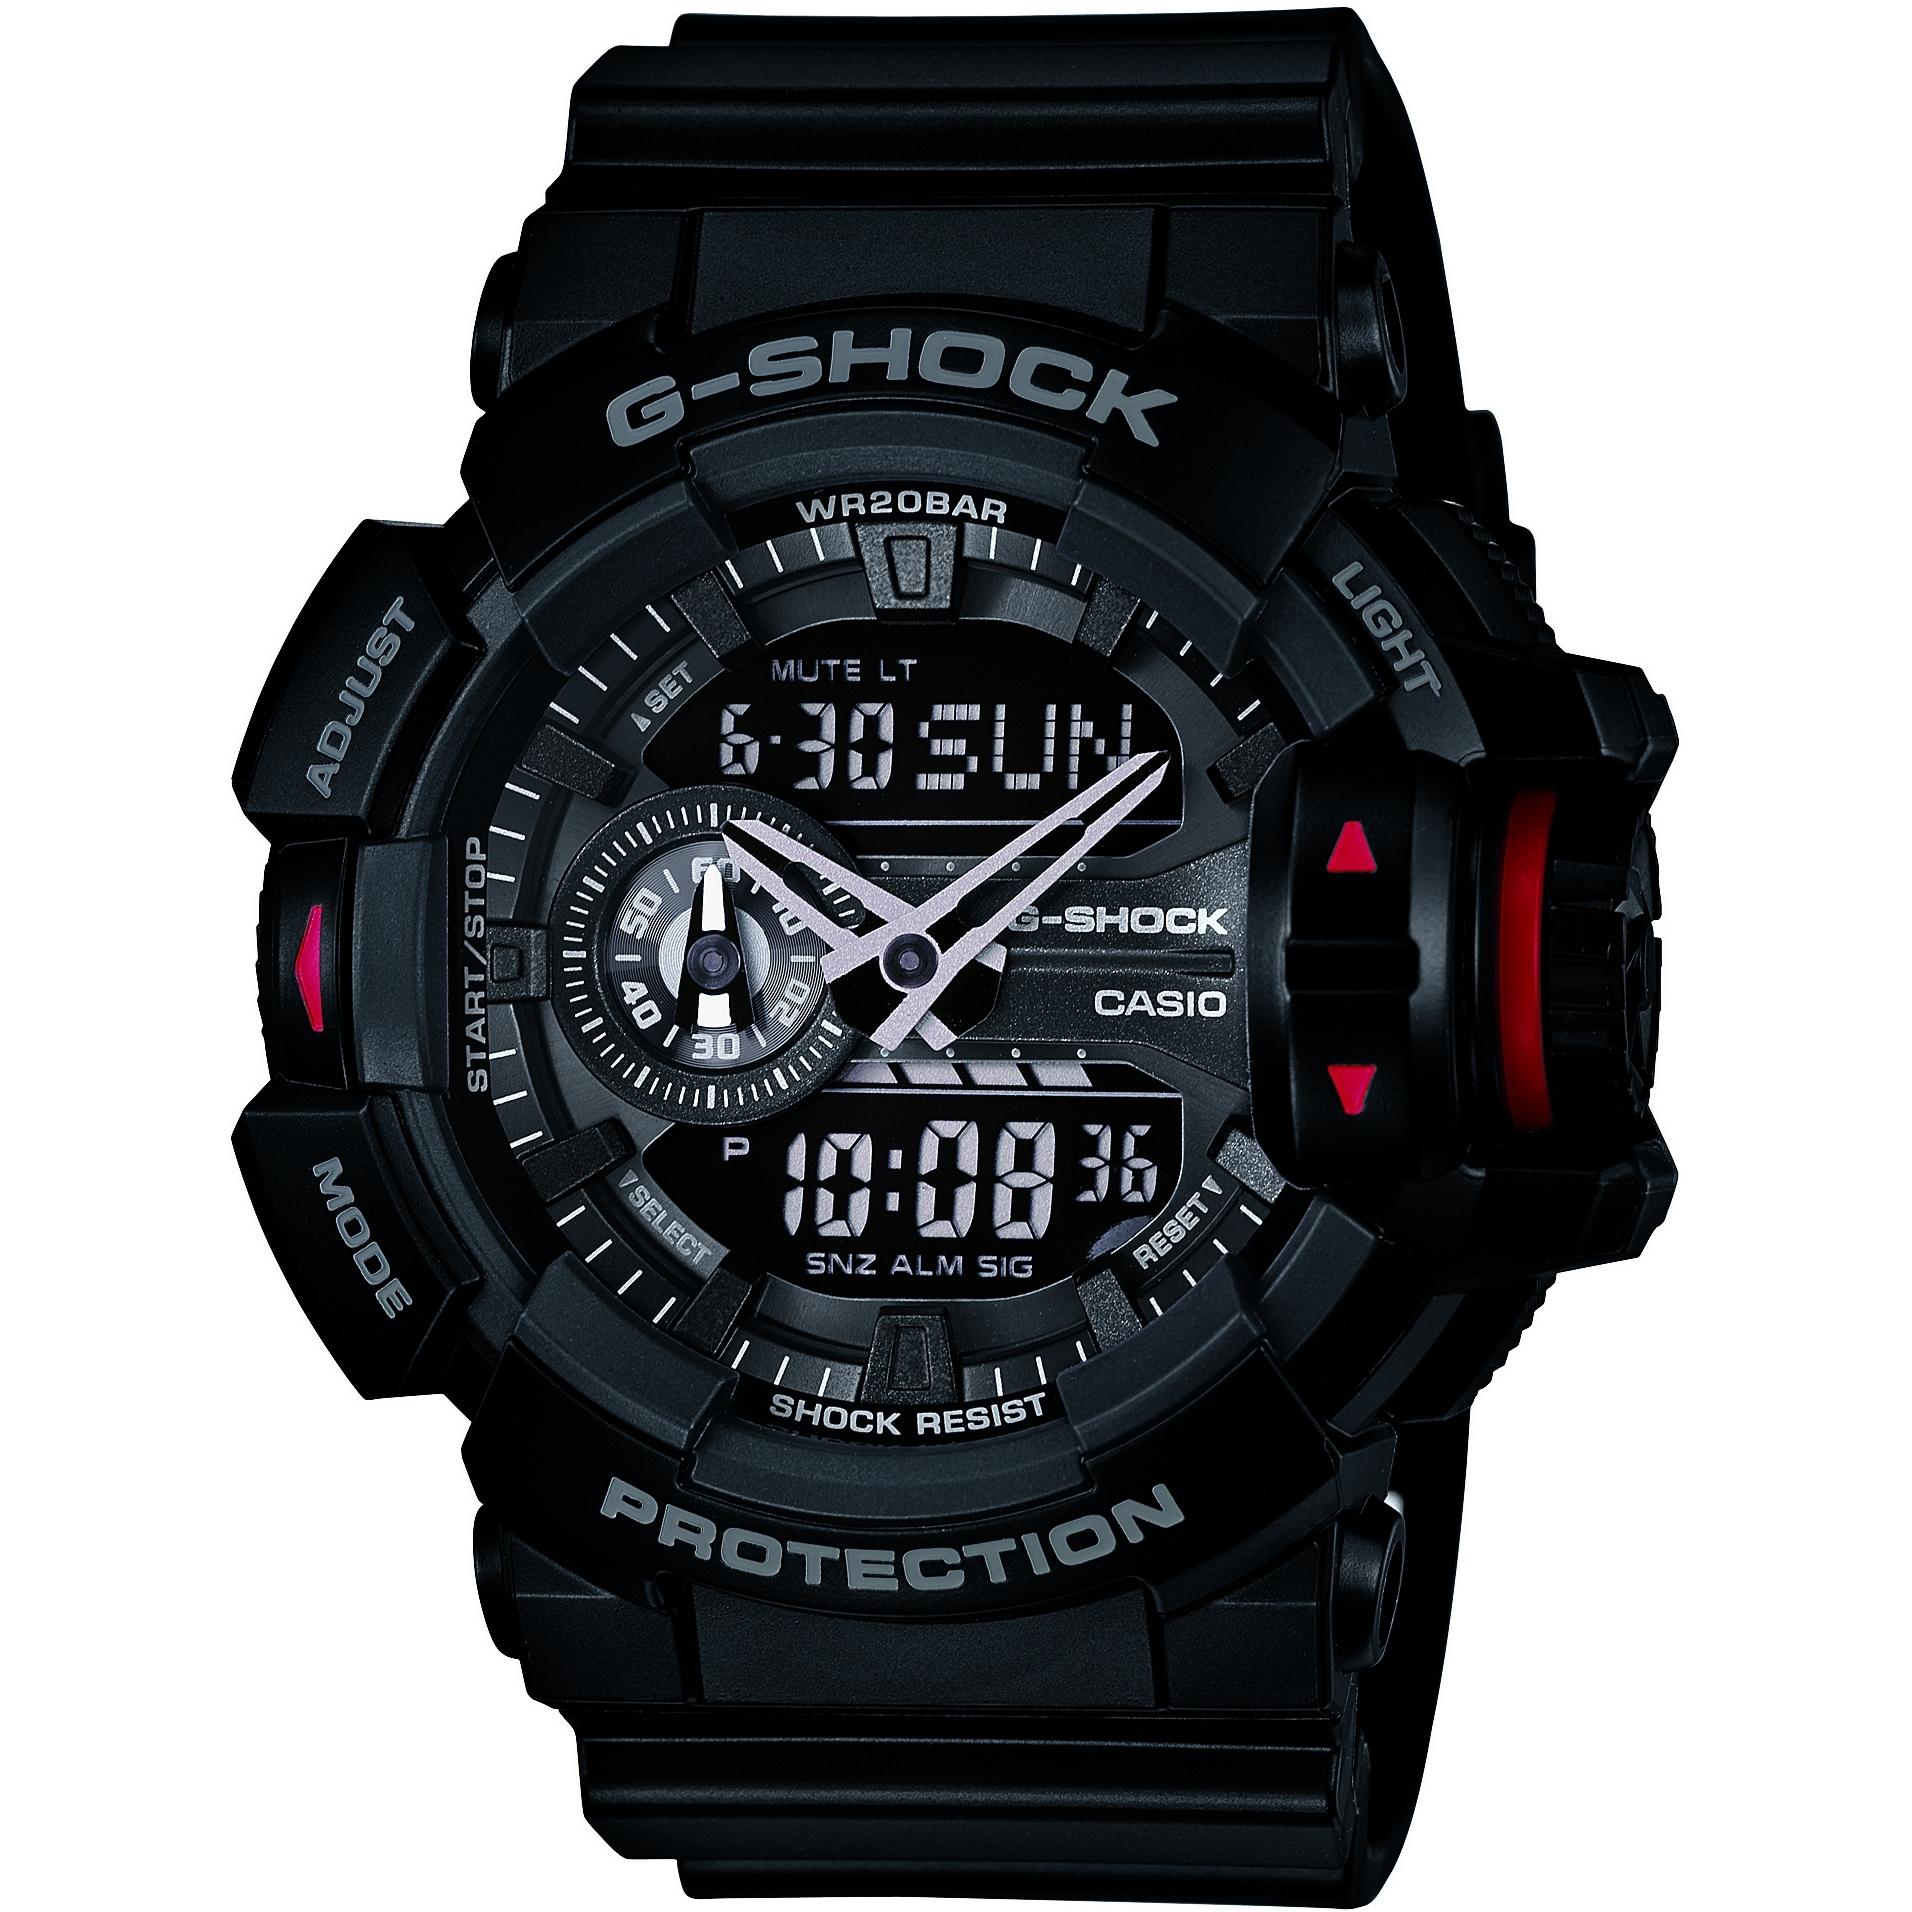 7d170220c7009 Gents Casio G-Shock Alarm Chronograph Watch (GA-400-1BER ...